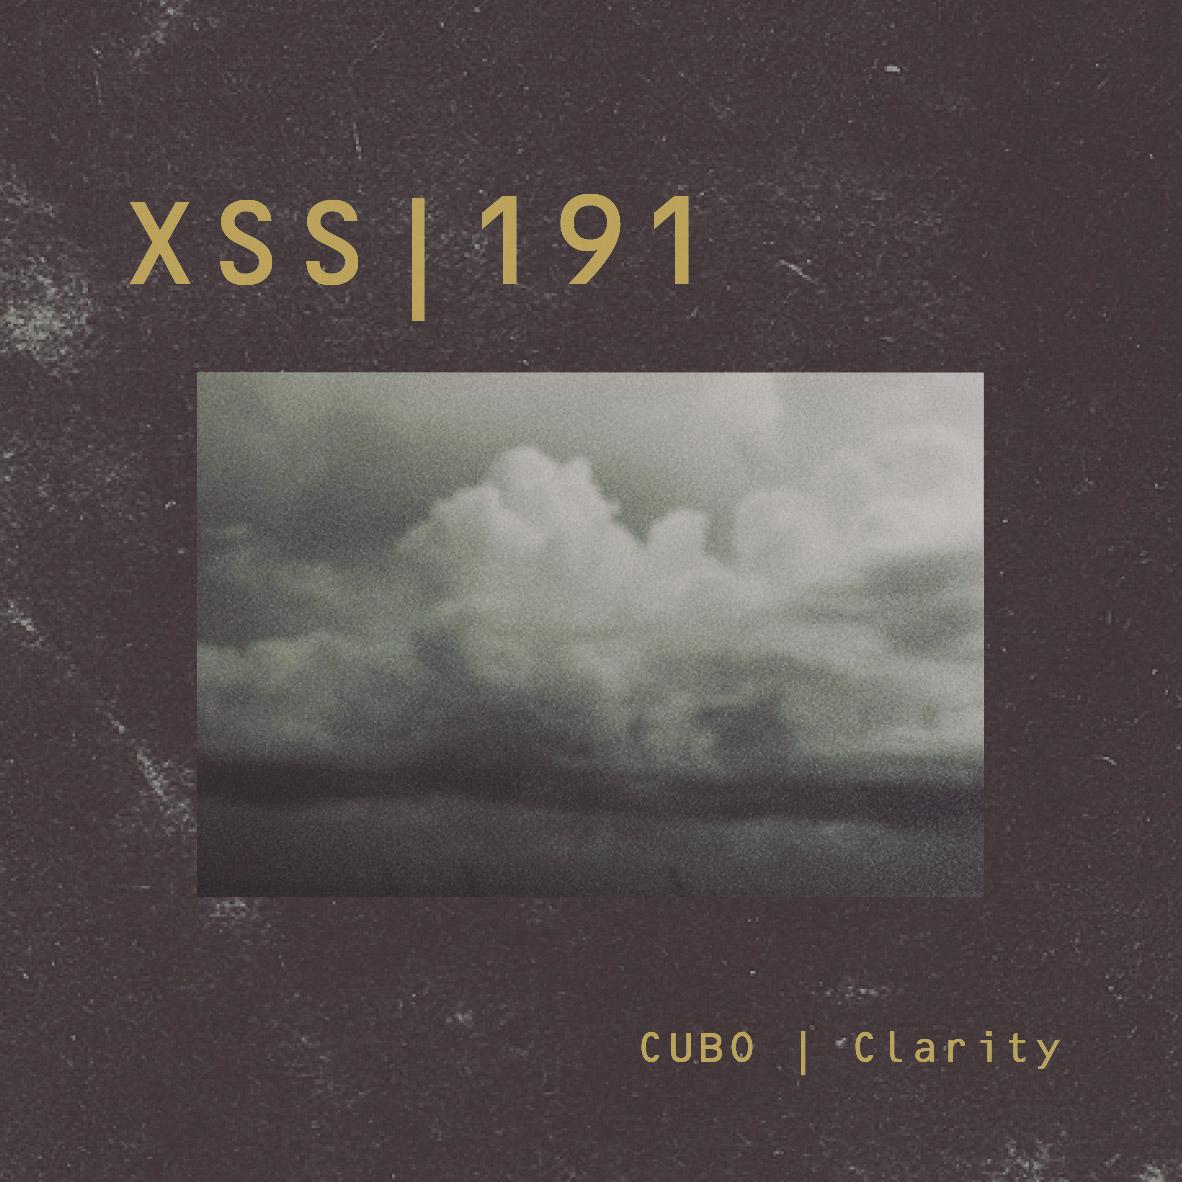 XSS191 | Cubo | Clarity